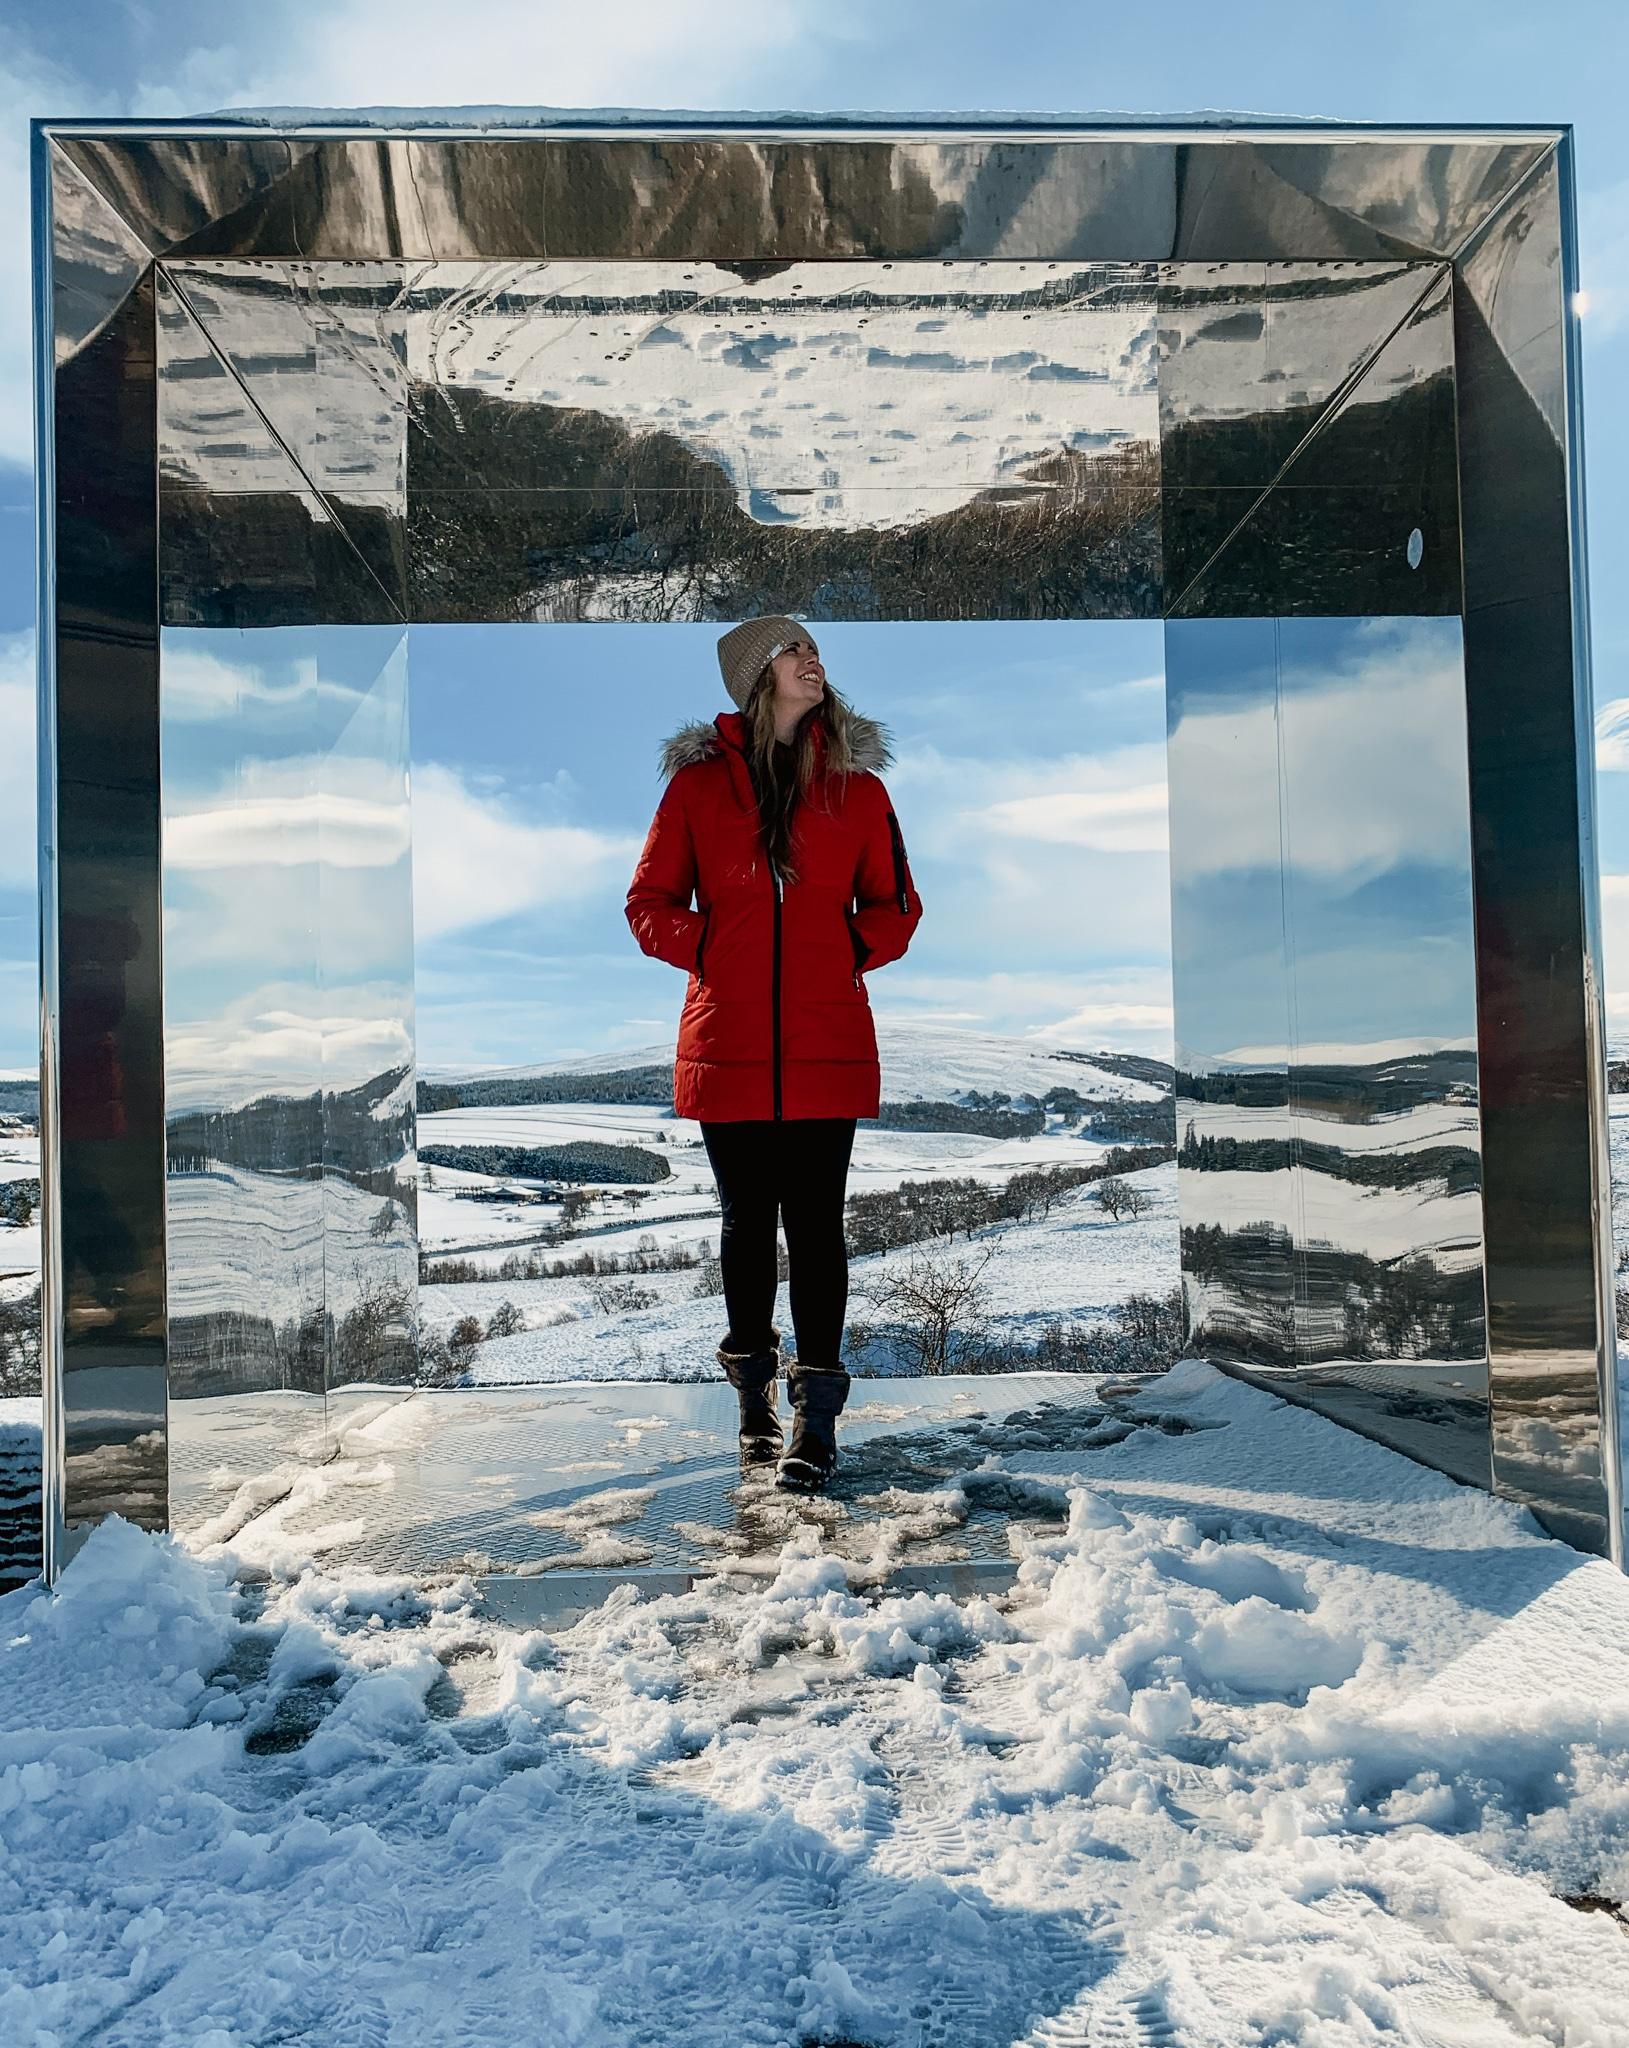 Cairngorms Nationalpark: Die SnowRoads Scenic Route in den Highlands - Art Installation Still